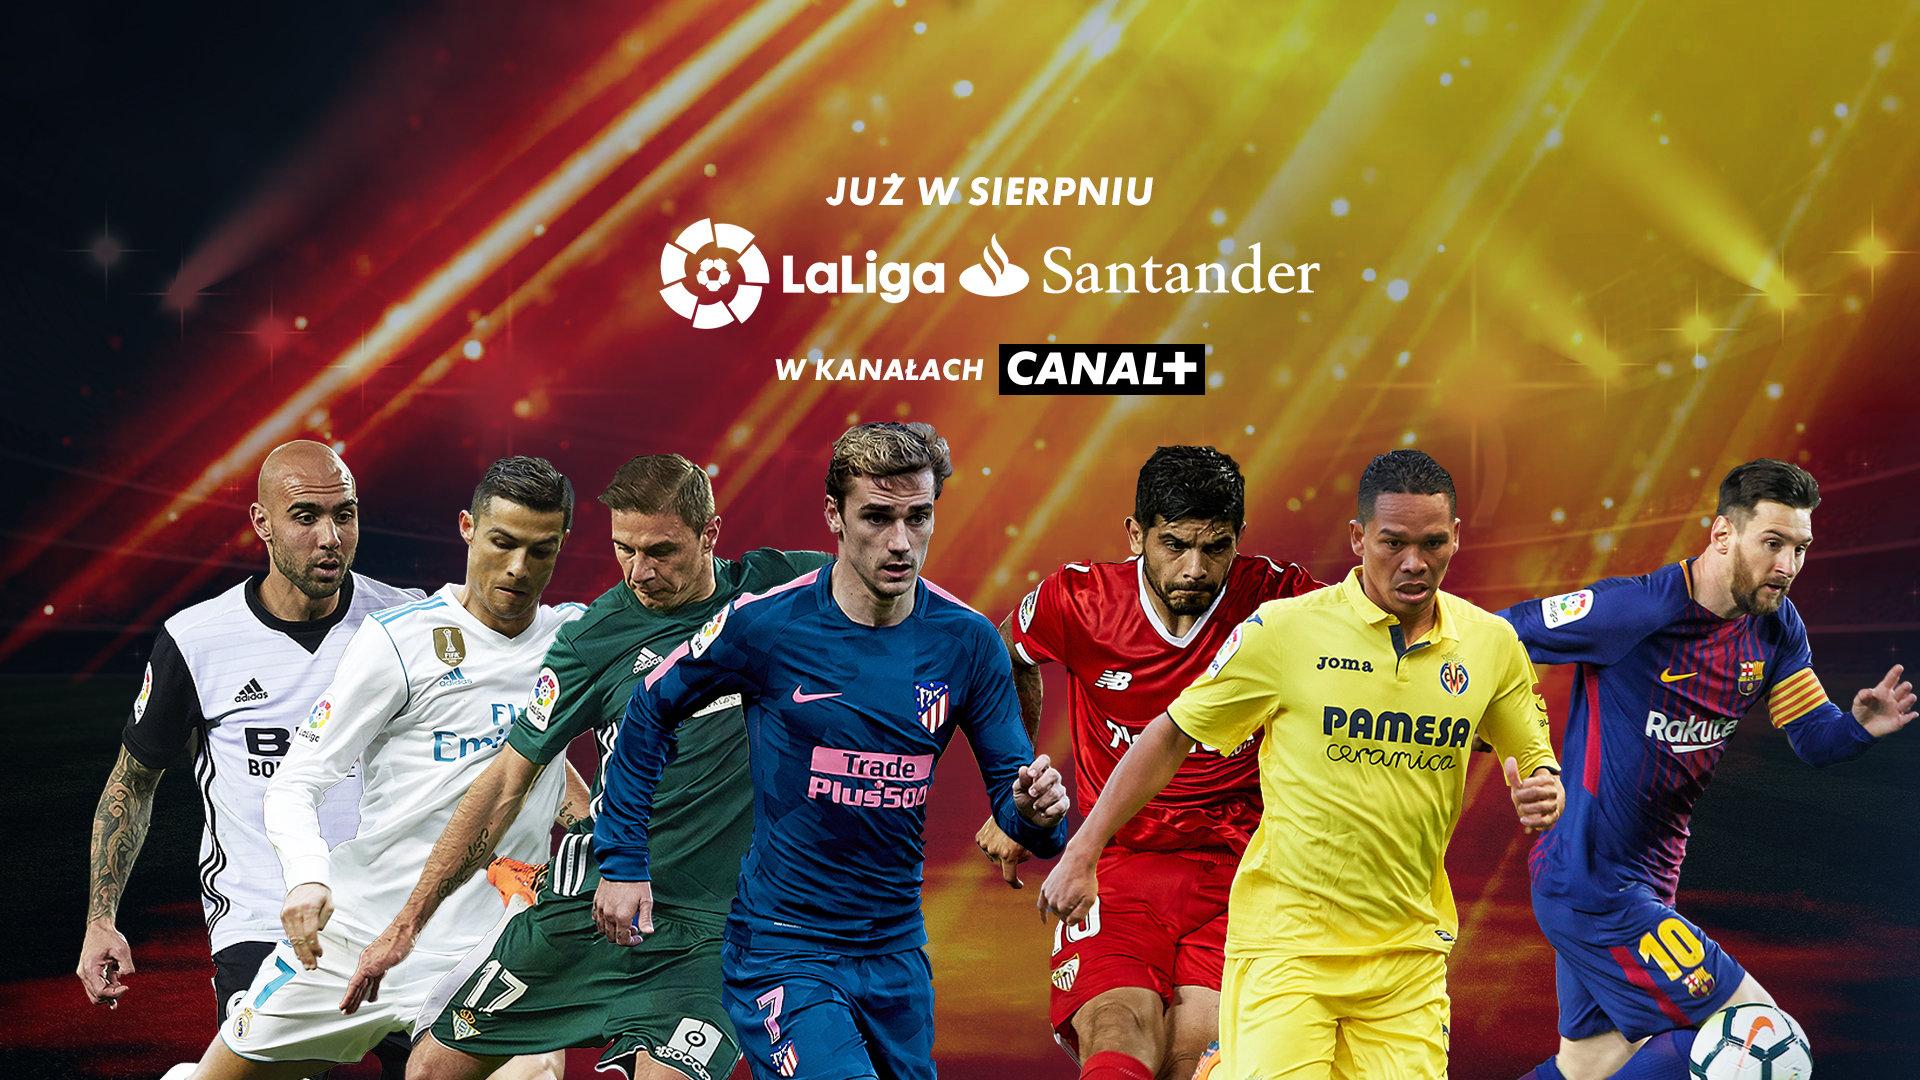 Hiszpańska LaLiga Santander w CANAL+ i ELEVEN SPORTS